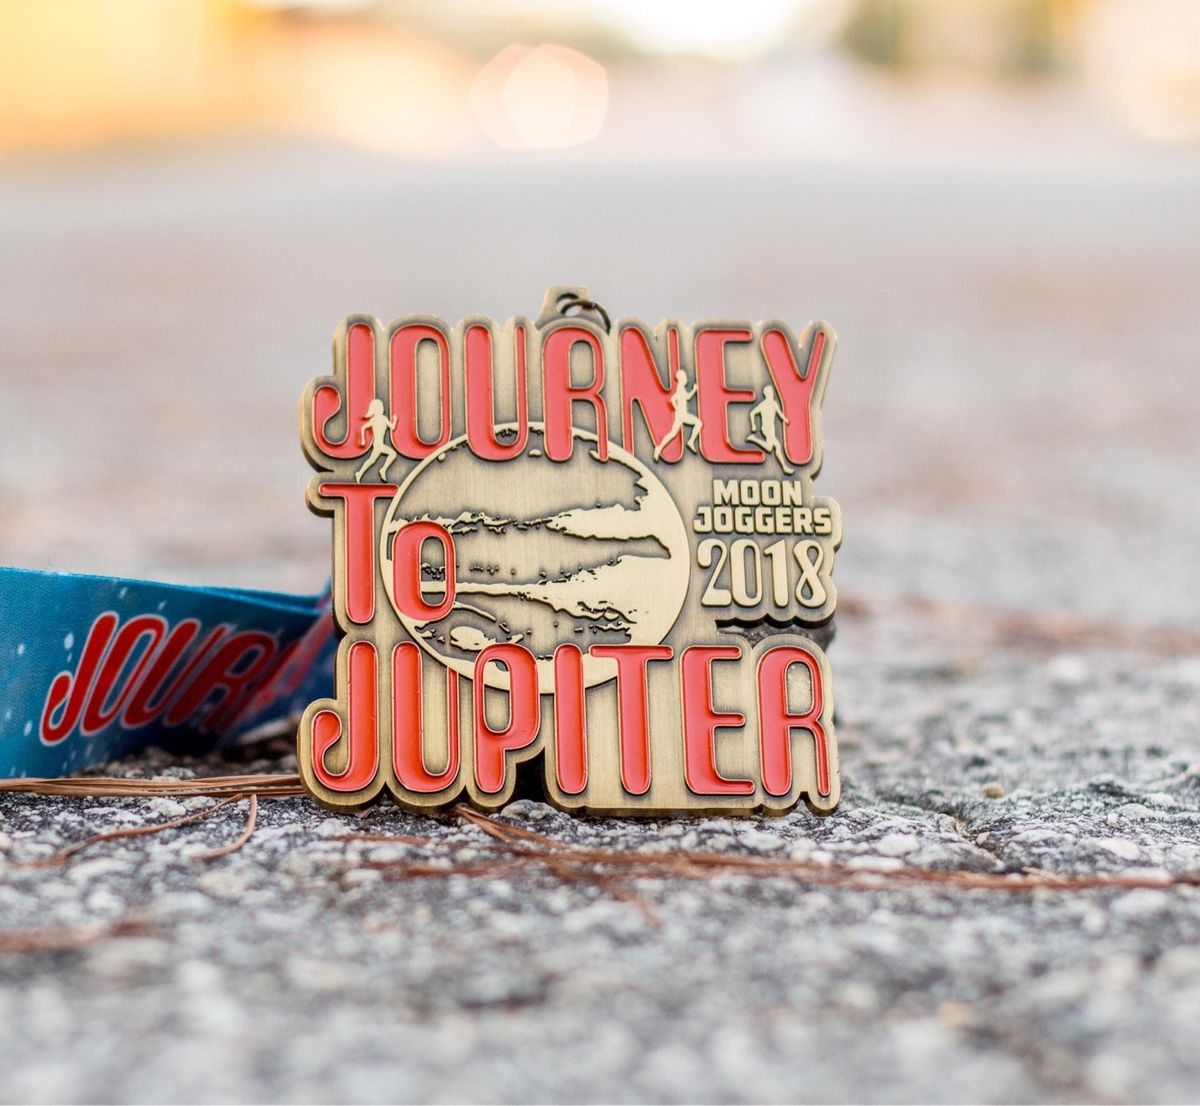 FREE SIGN UP Journey to Jupiter Running & Walking Challenge 2018 -Newark